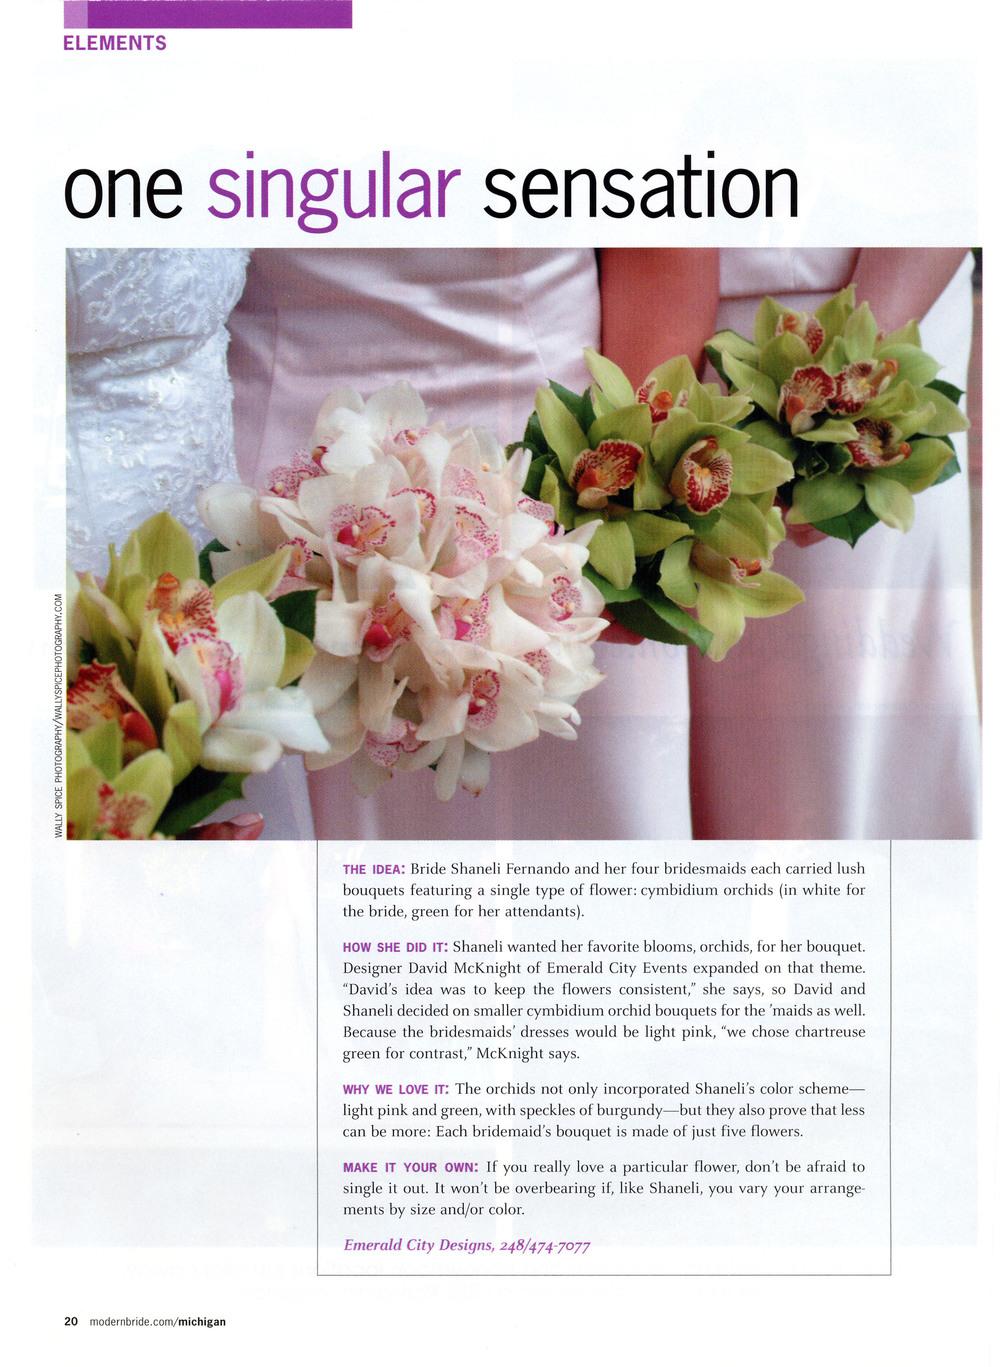 one singular sensation page.jpg